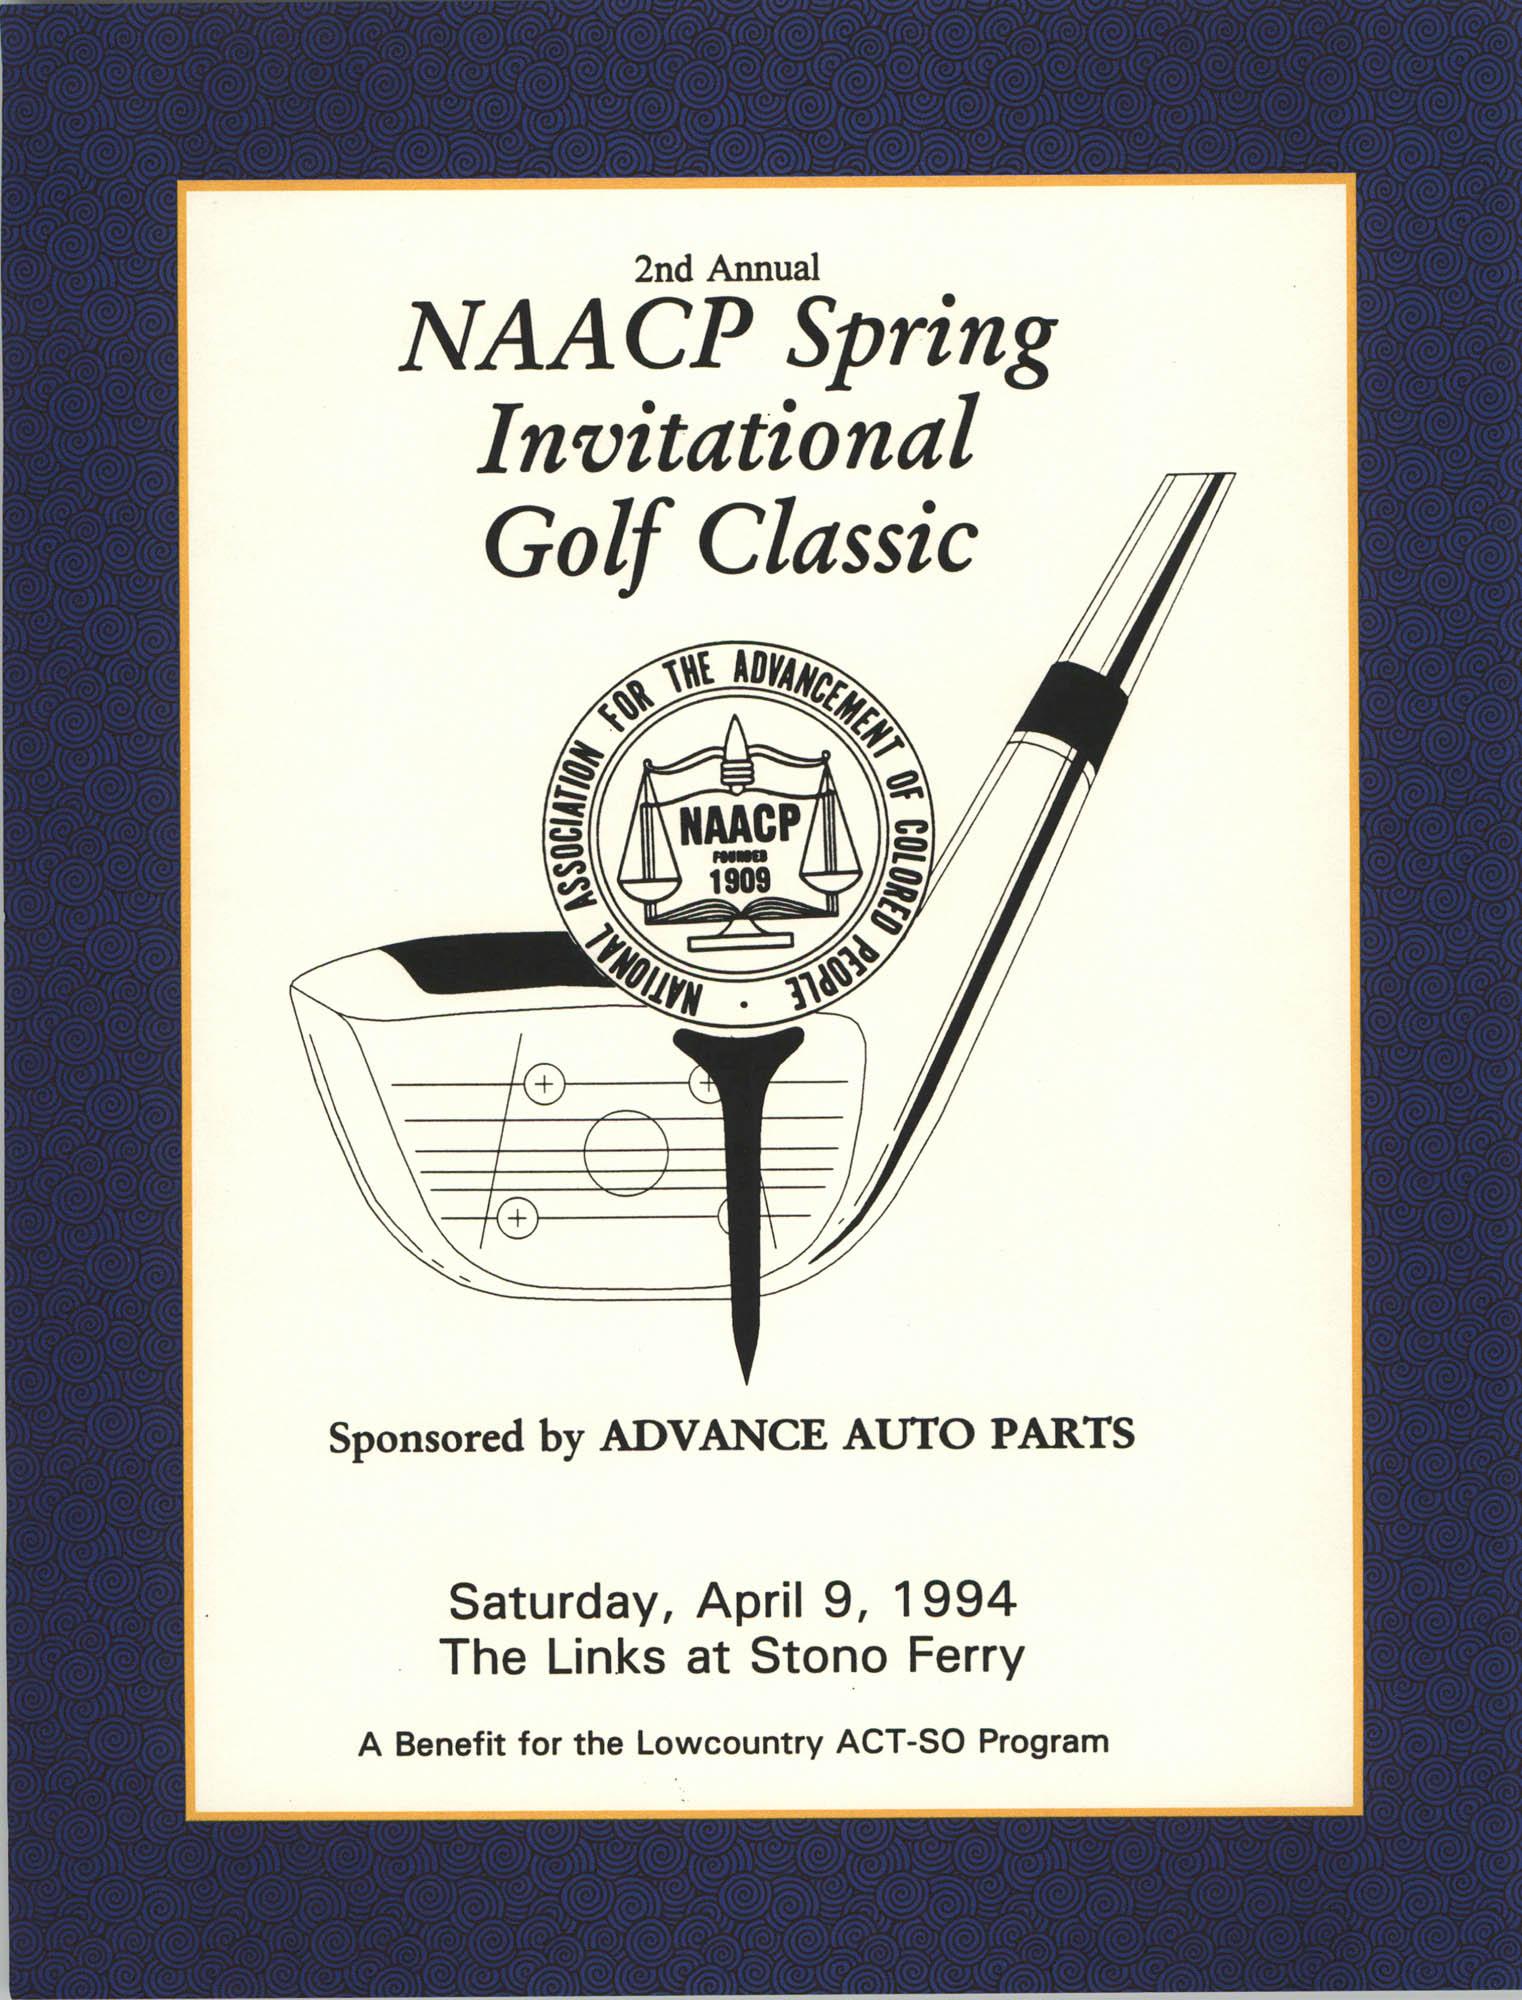 Program, 2nd Annual NAACP Spring Invitational Golf Classic, ACT-SO Program,  Stono Ferry, April 9, 1994